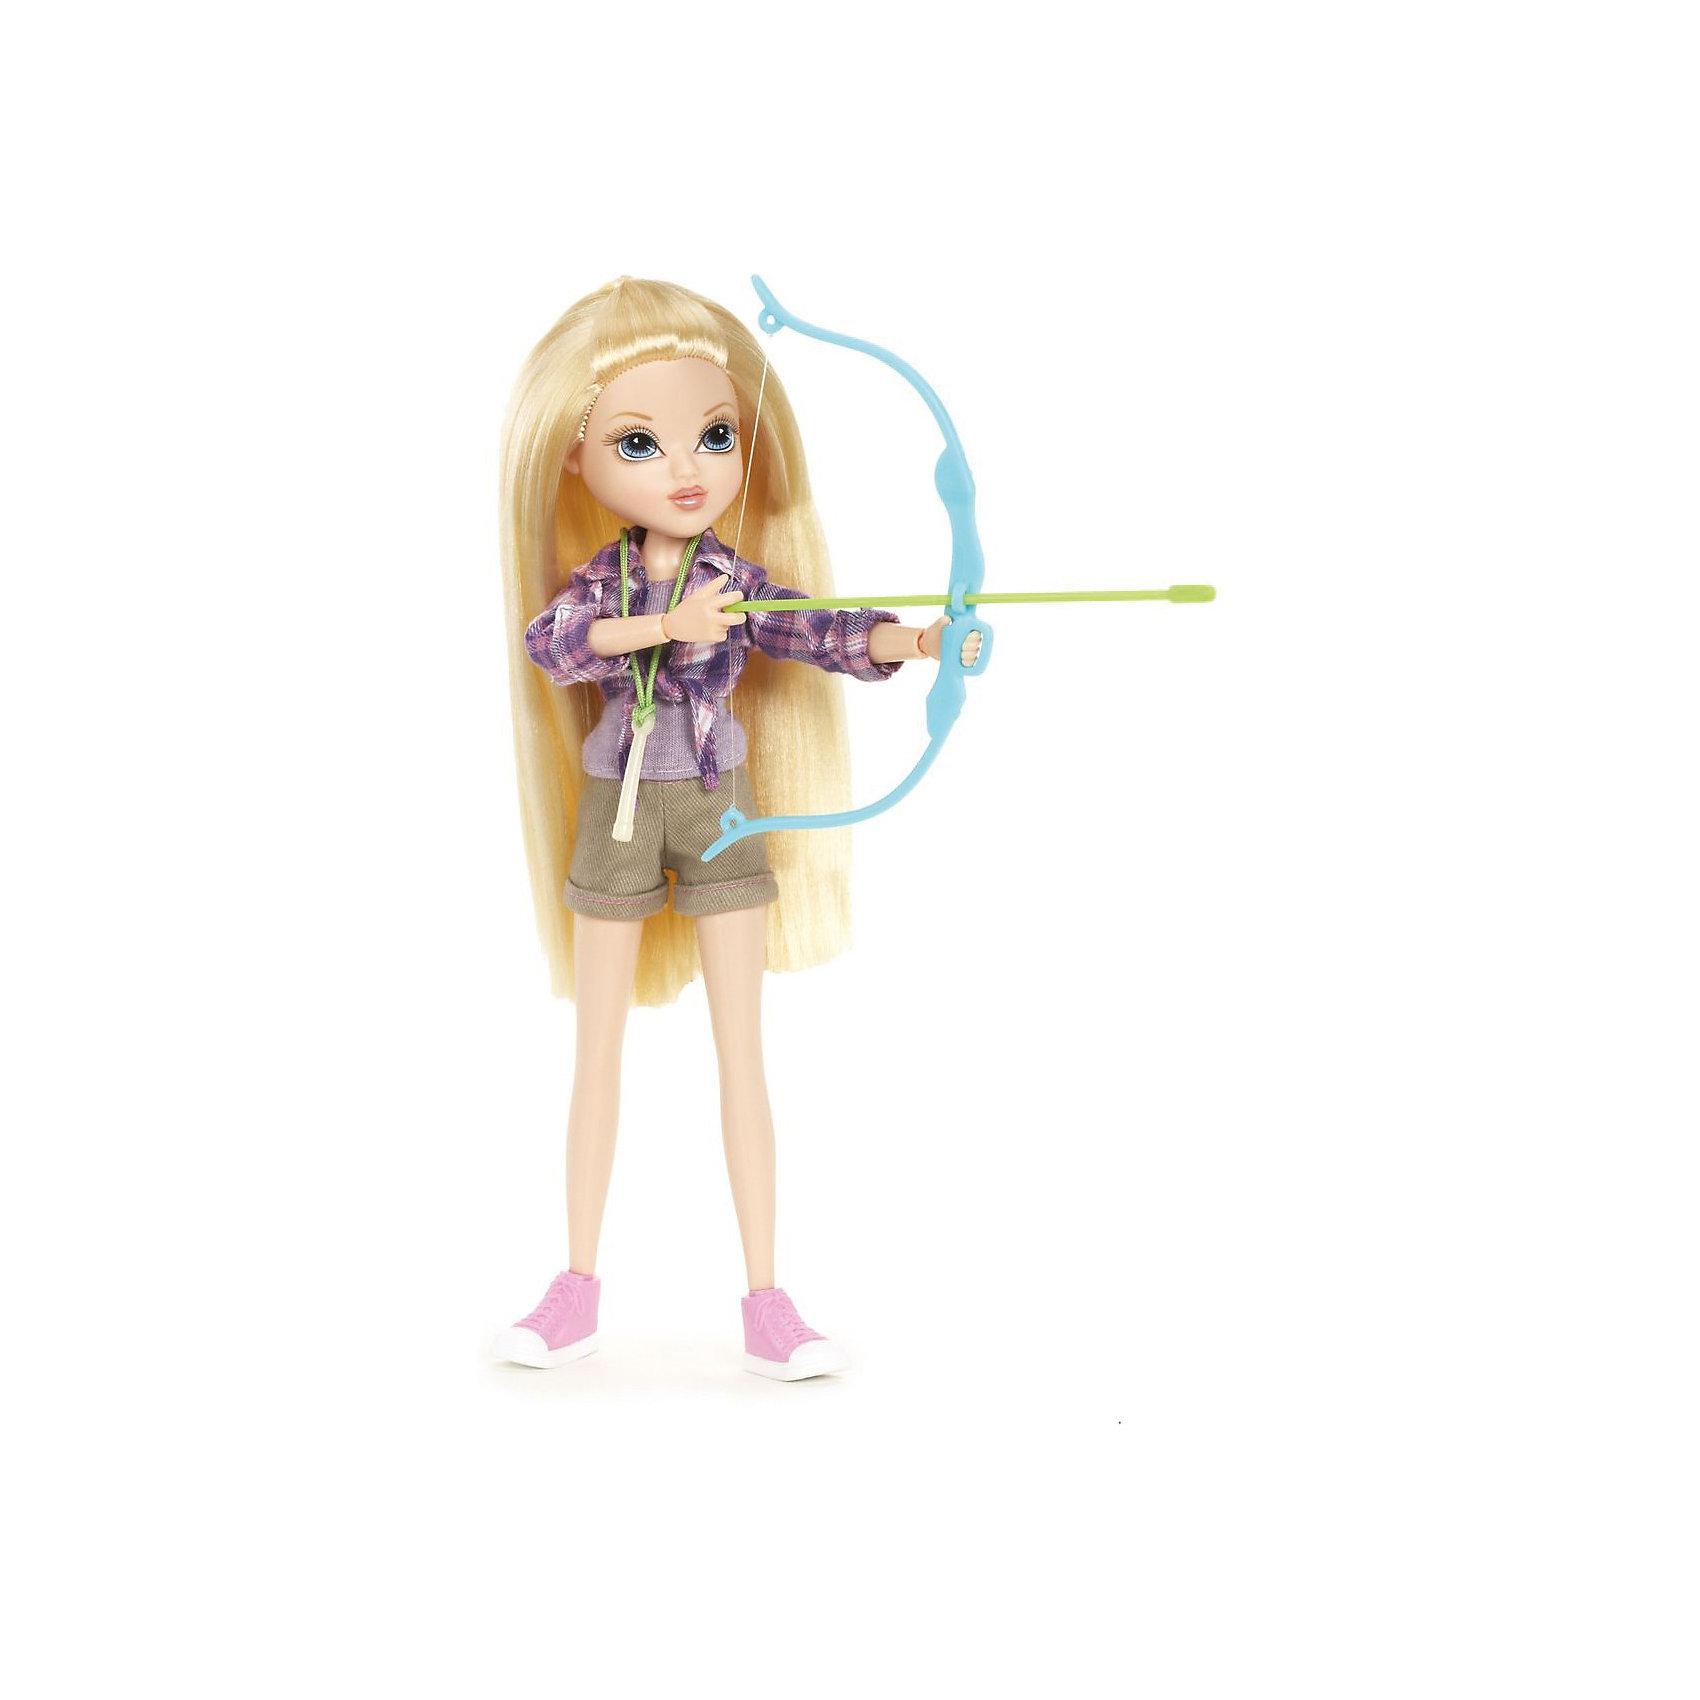 Moxie Кукла Эйвери Юные скауты, Moxie moxie mini 538783 мокси мини талли